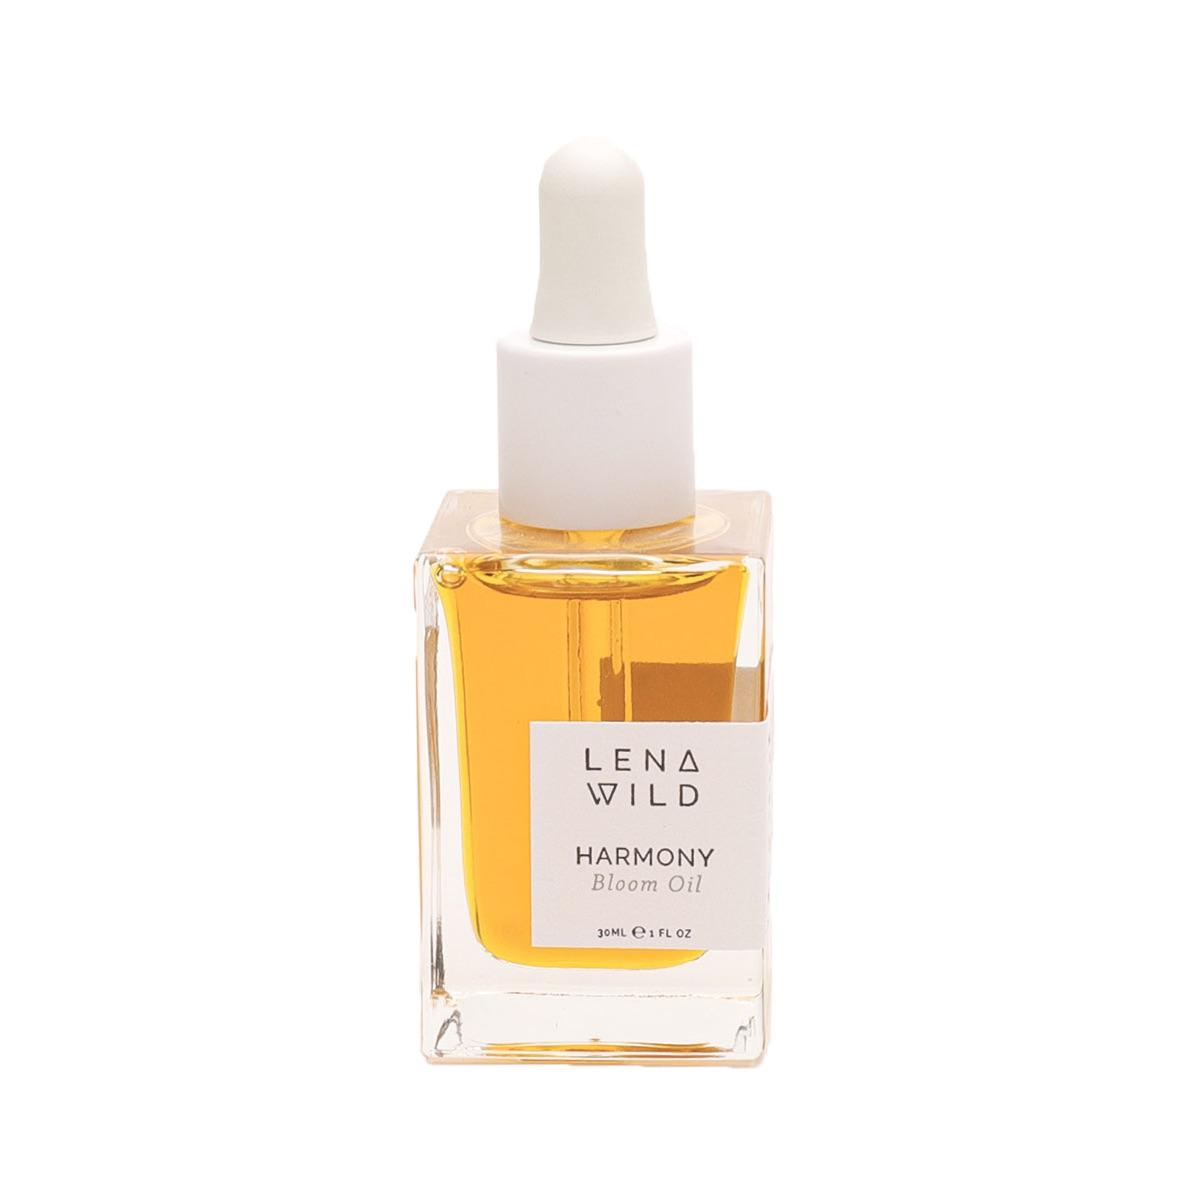 LENA WILD - Harmony Bloom Oil